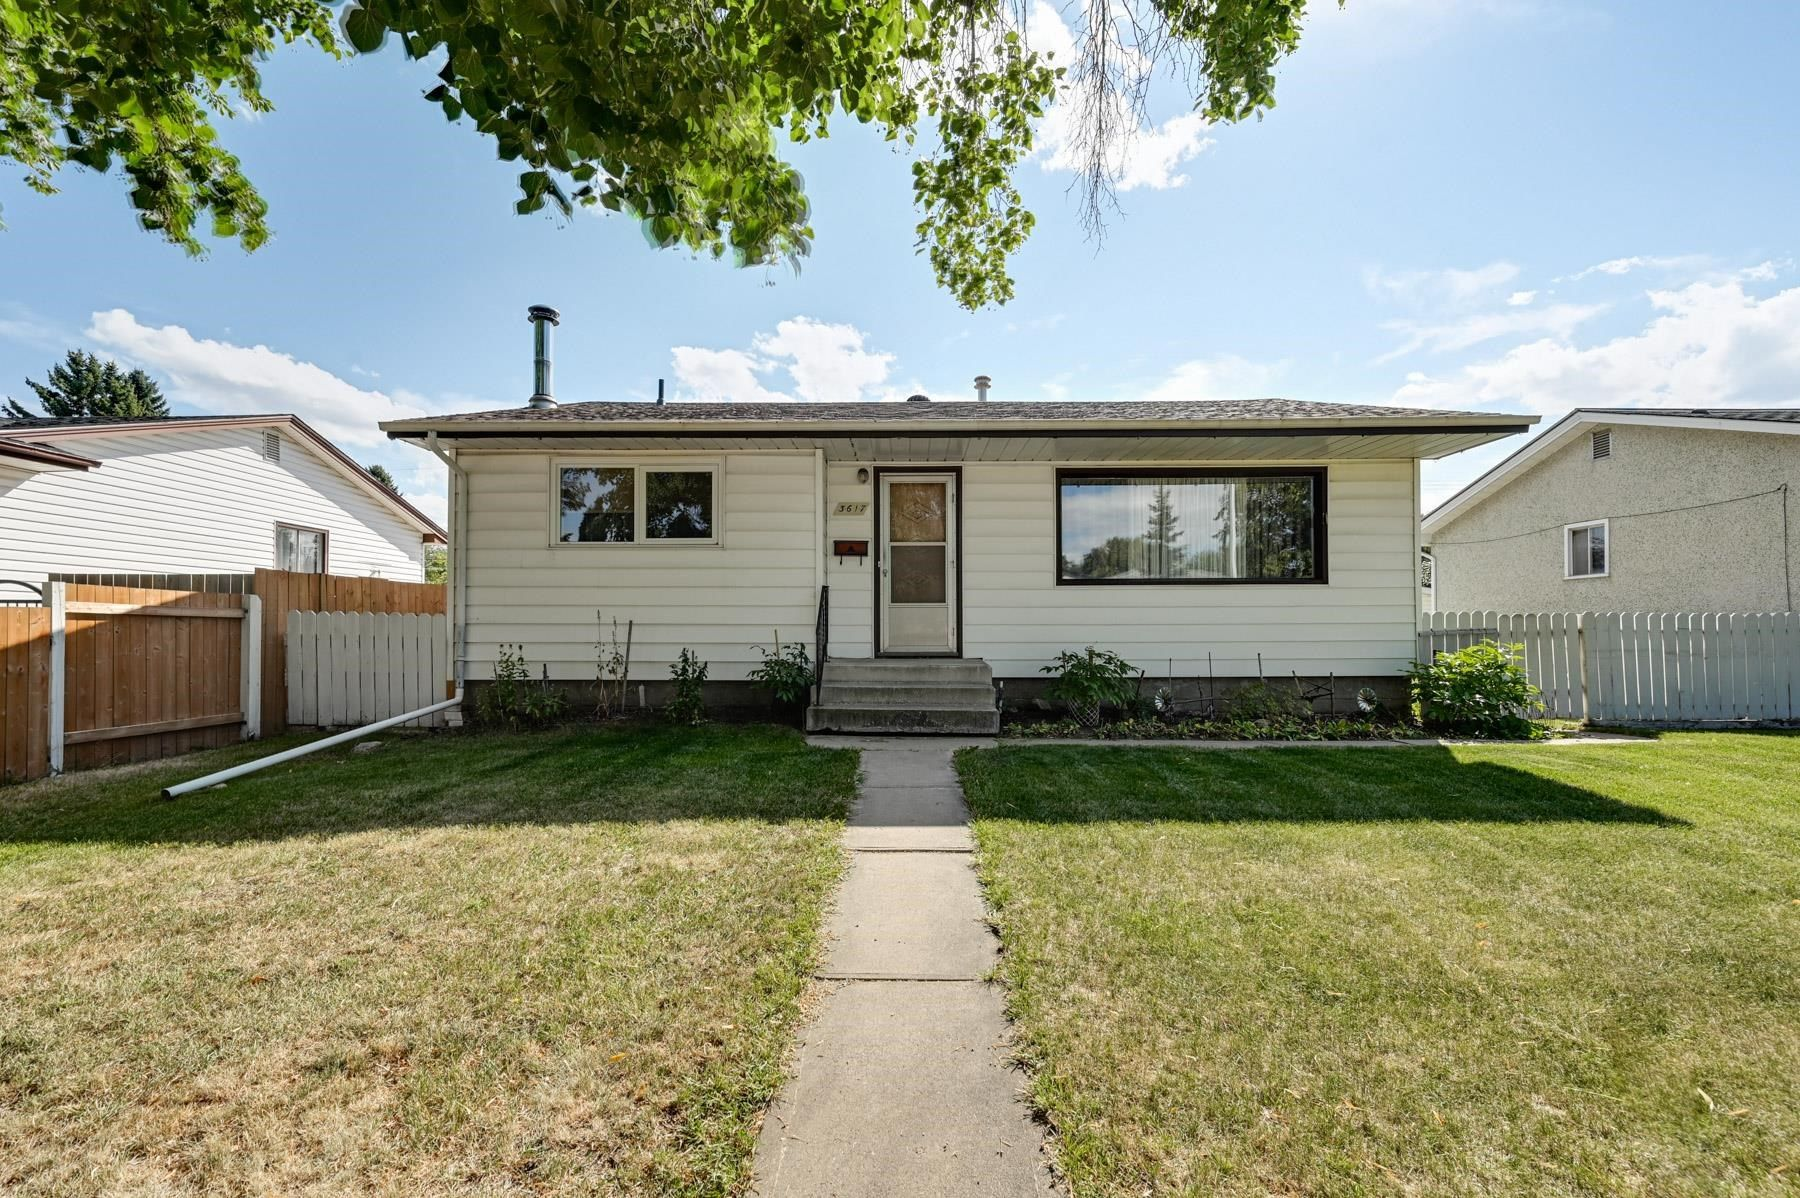 Main Photo: 3617 113 Avenue in Edmonton: Zone 23 House for sale : MLS®# E4261737